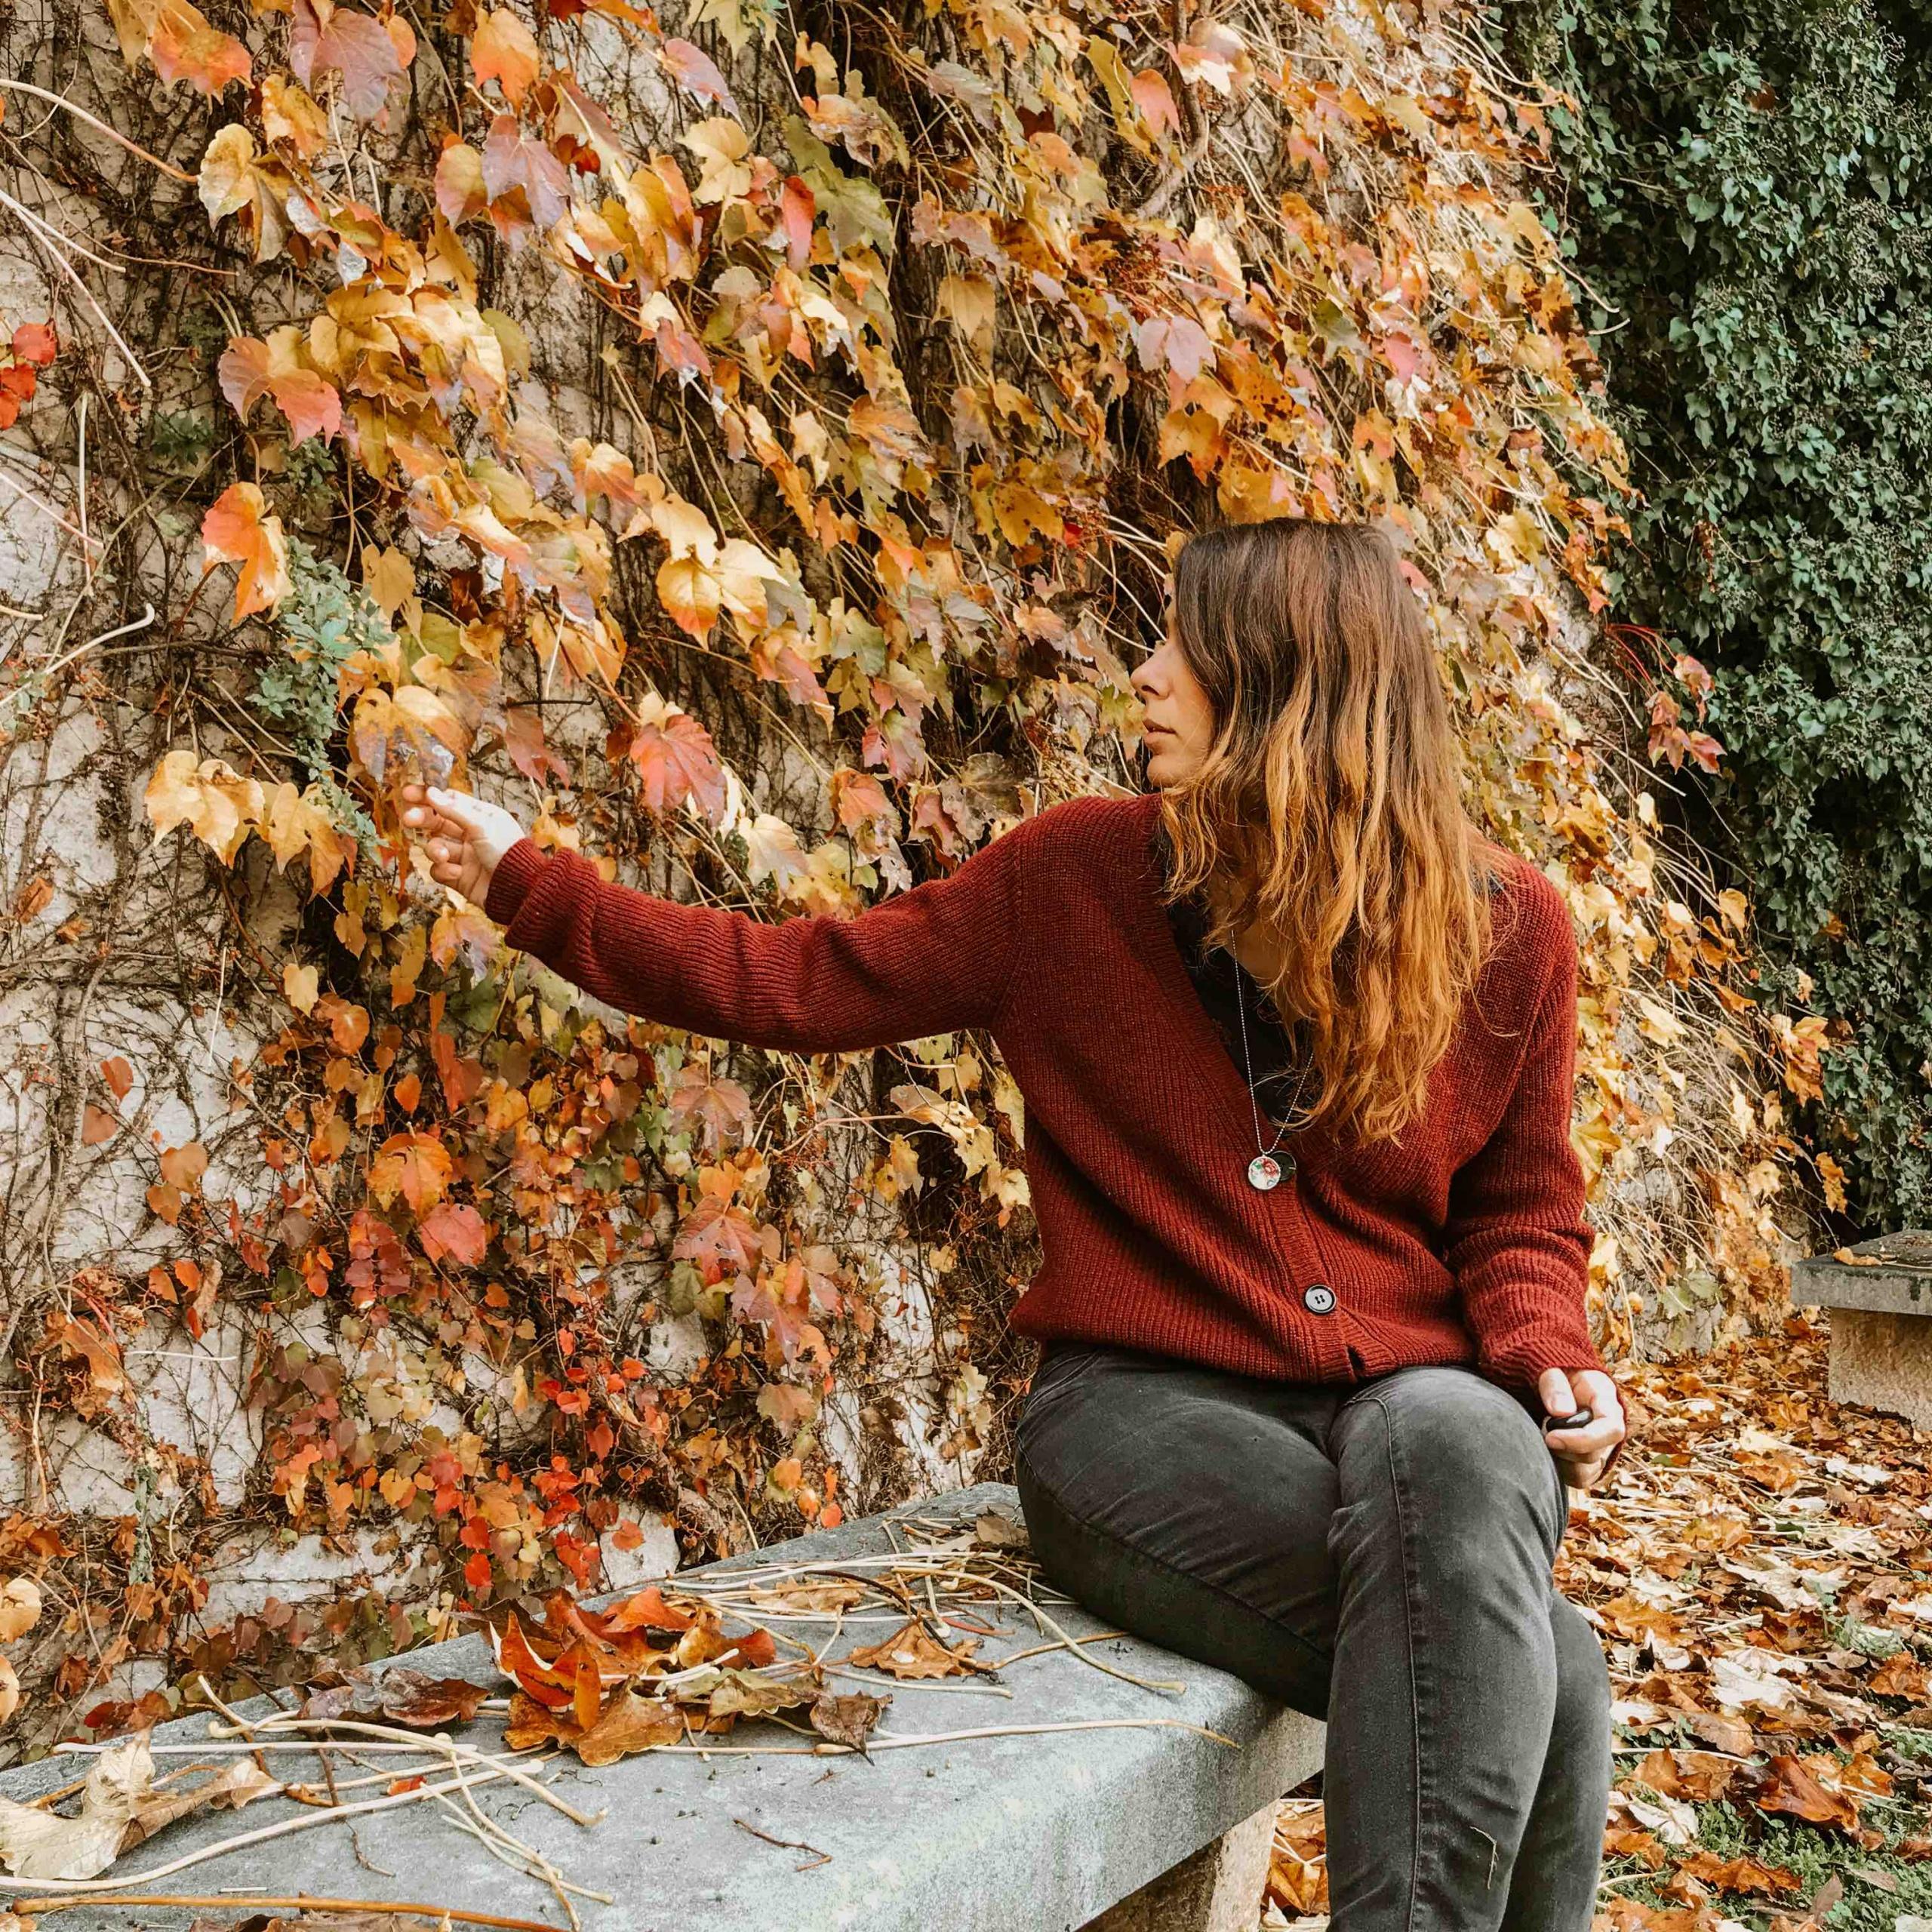 ragazza seduta su panchina foglie gialle e rosse dietro